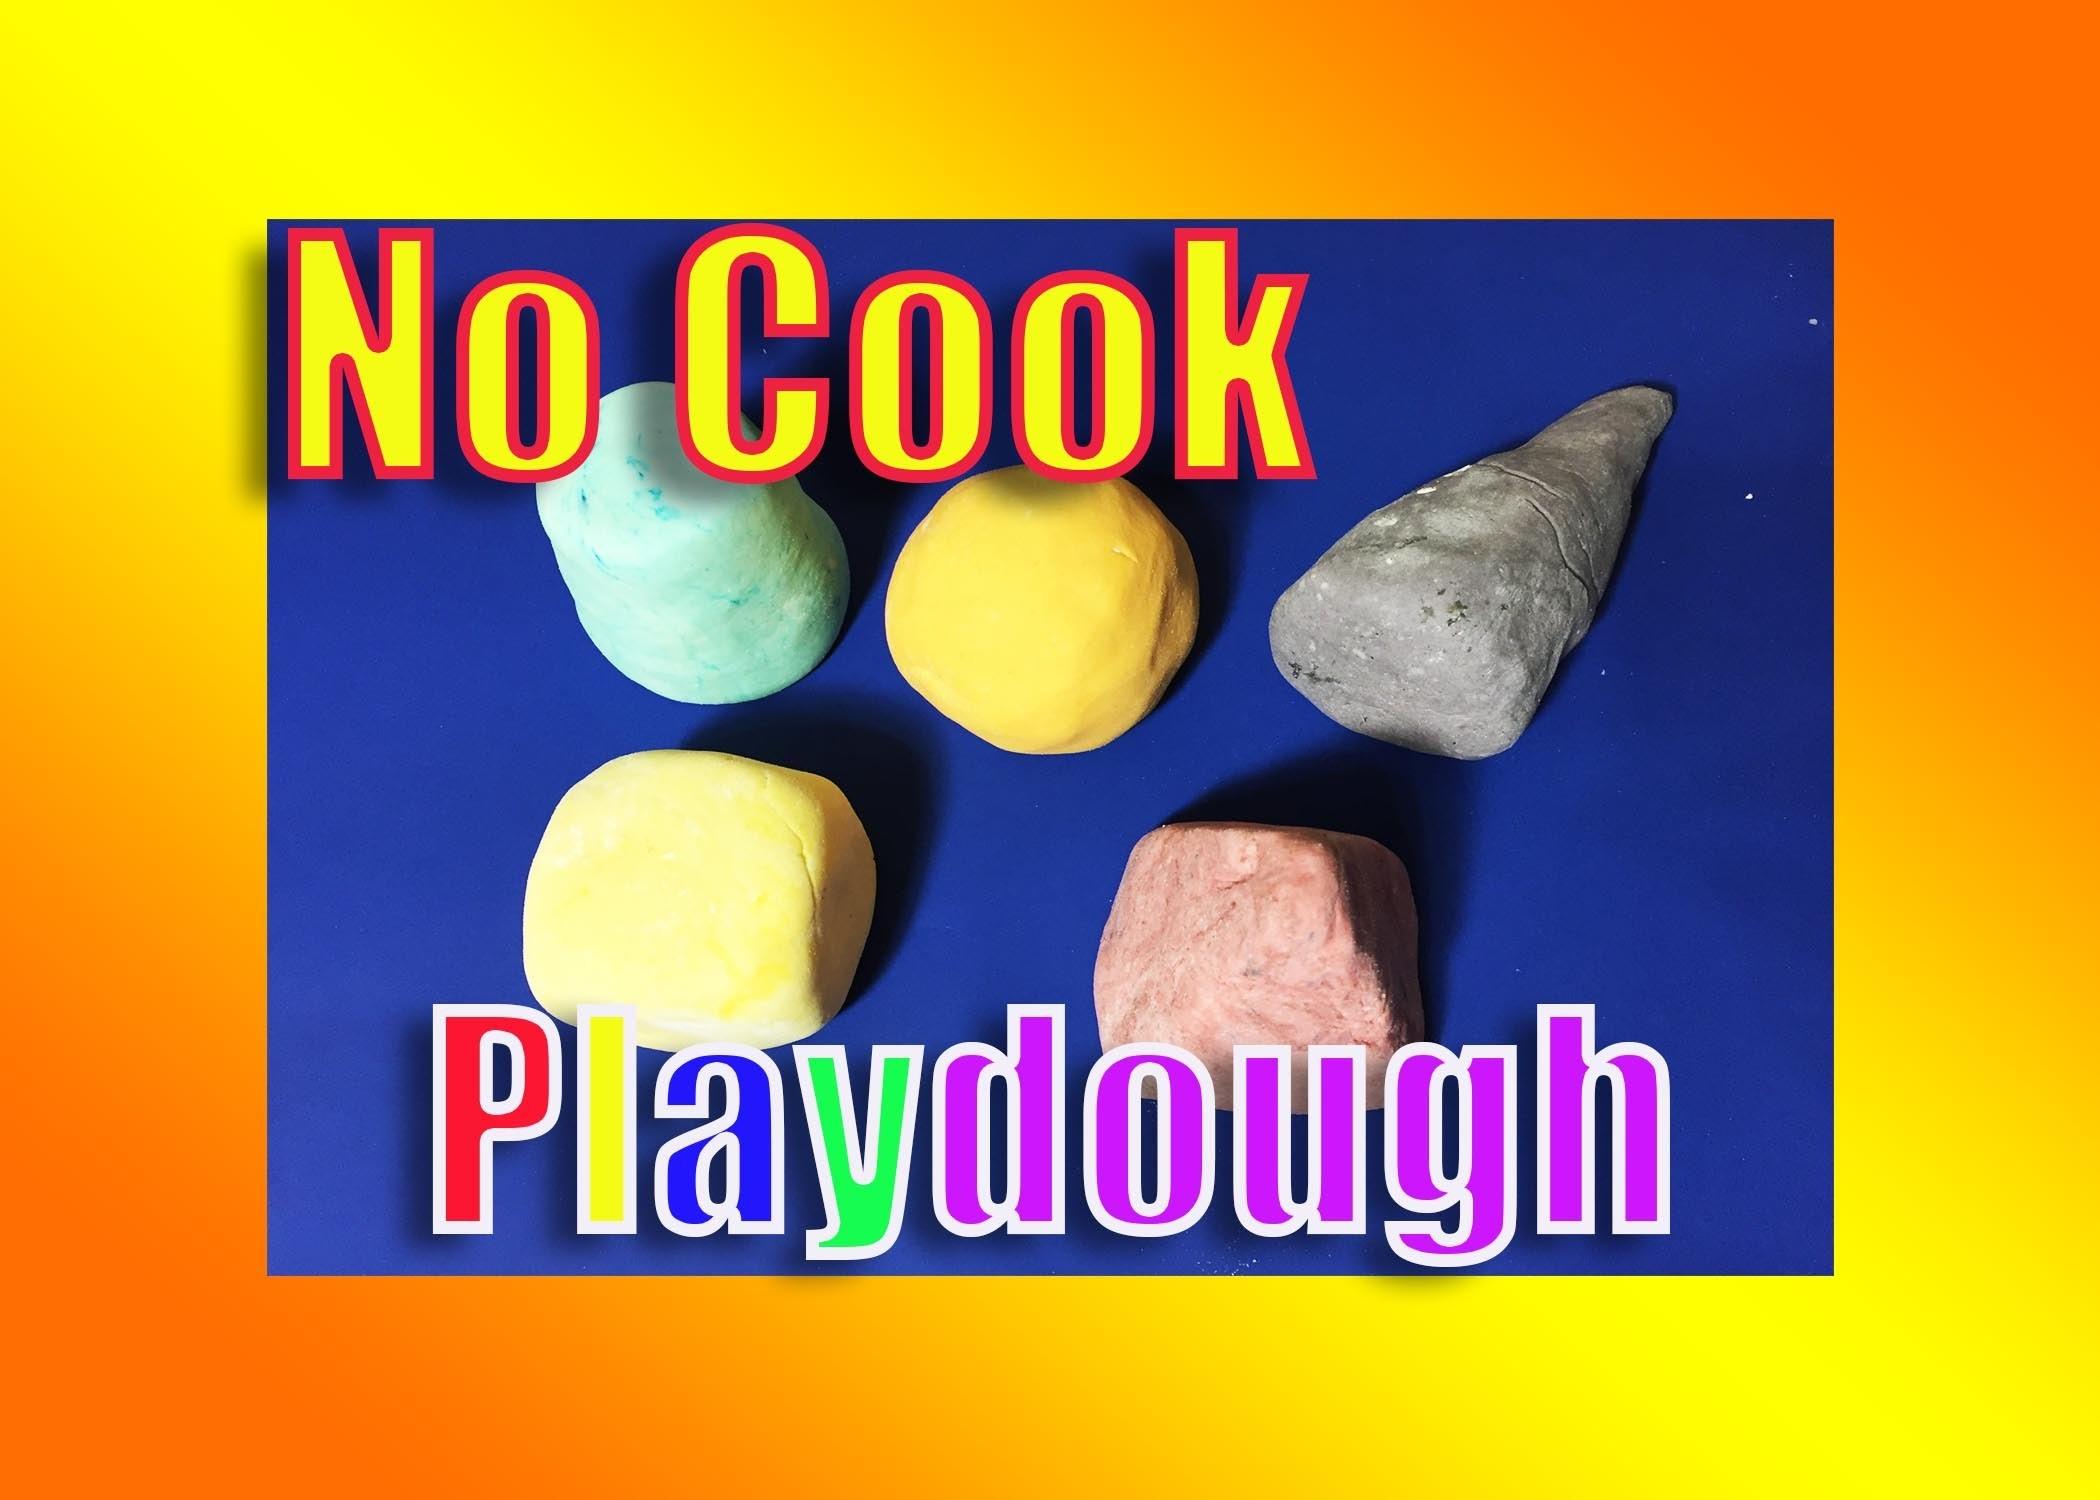 How to Make PLAY DOUGH at Home | DIY Make Your Own Play Dough NO COOK